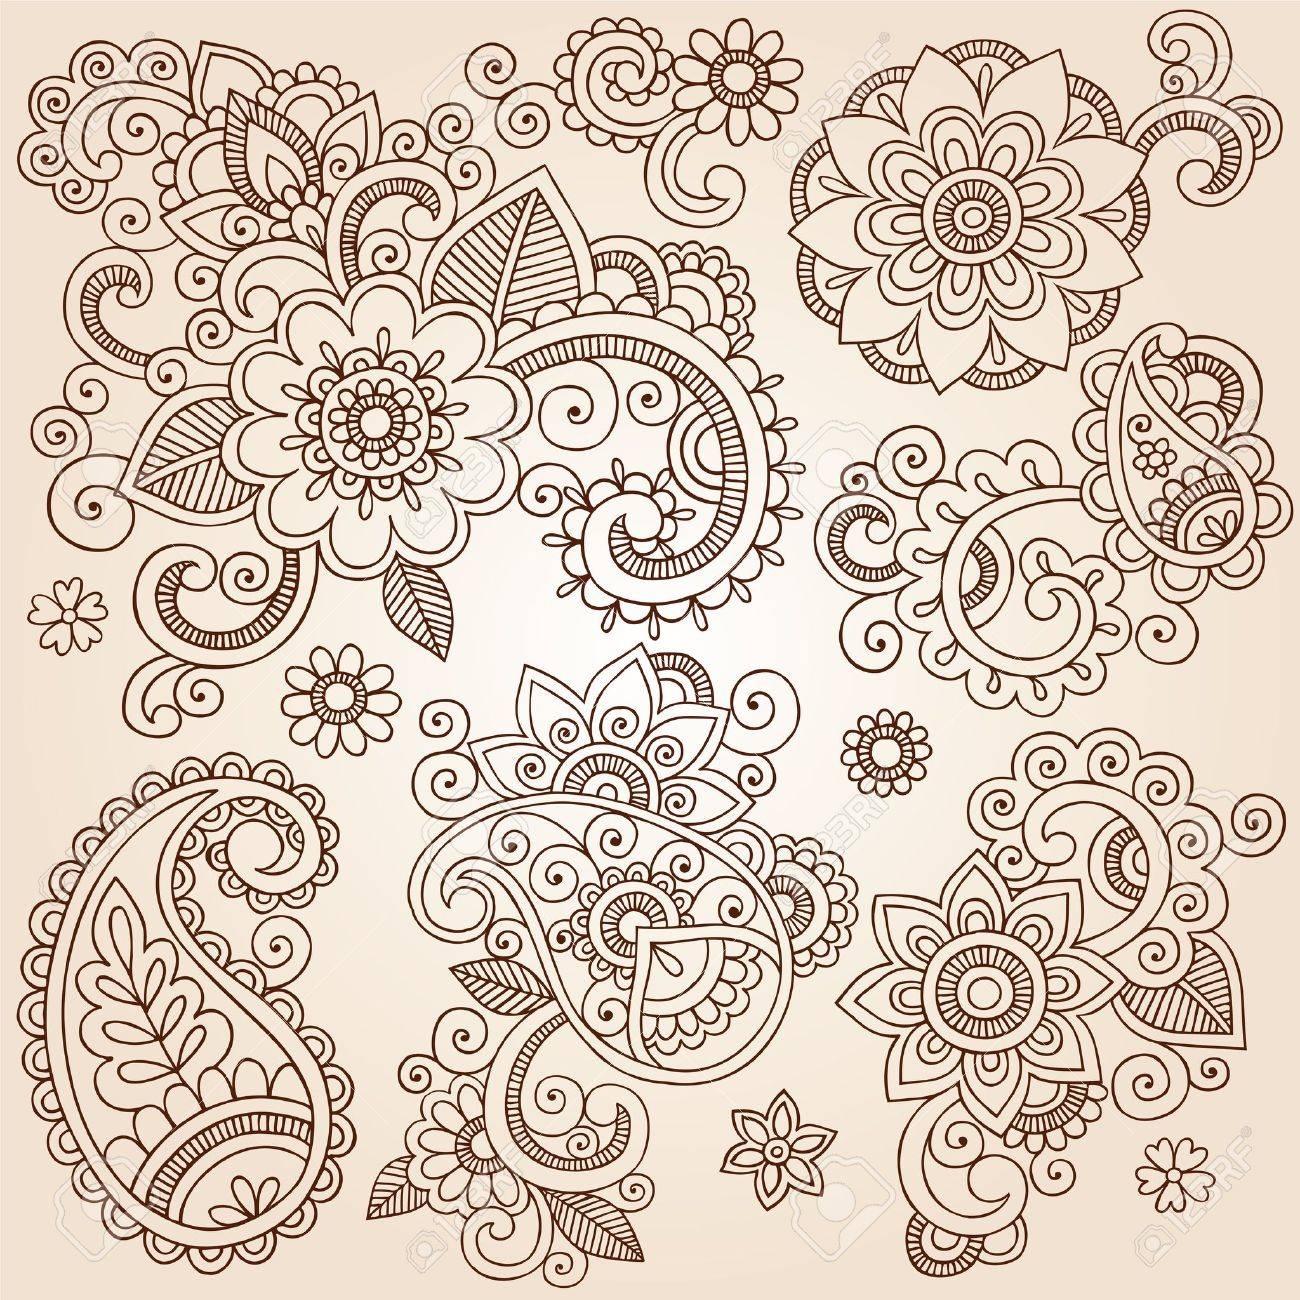 Henna Paisley Flowers Mehndi Tattoo Doodles Set- Abstract Floral Vector Illustration Design Elements Stock Vector - 17164966